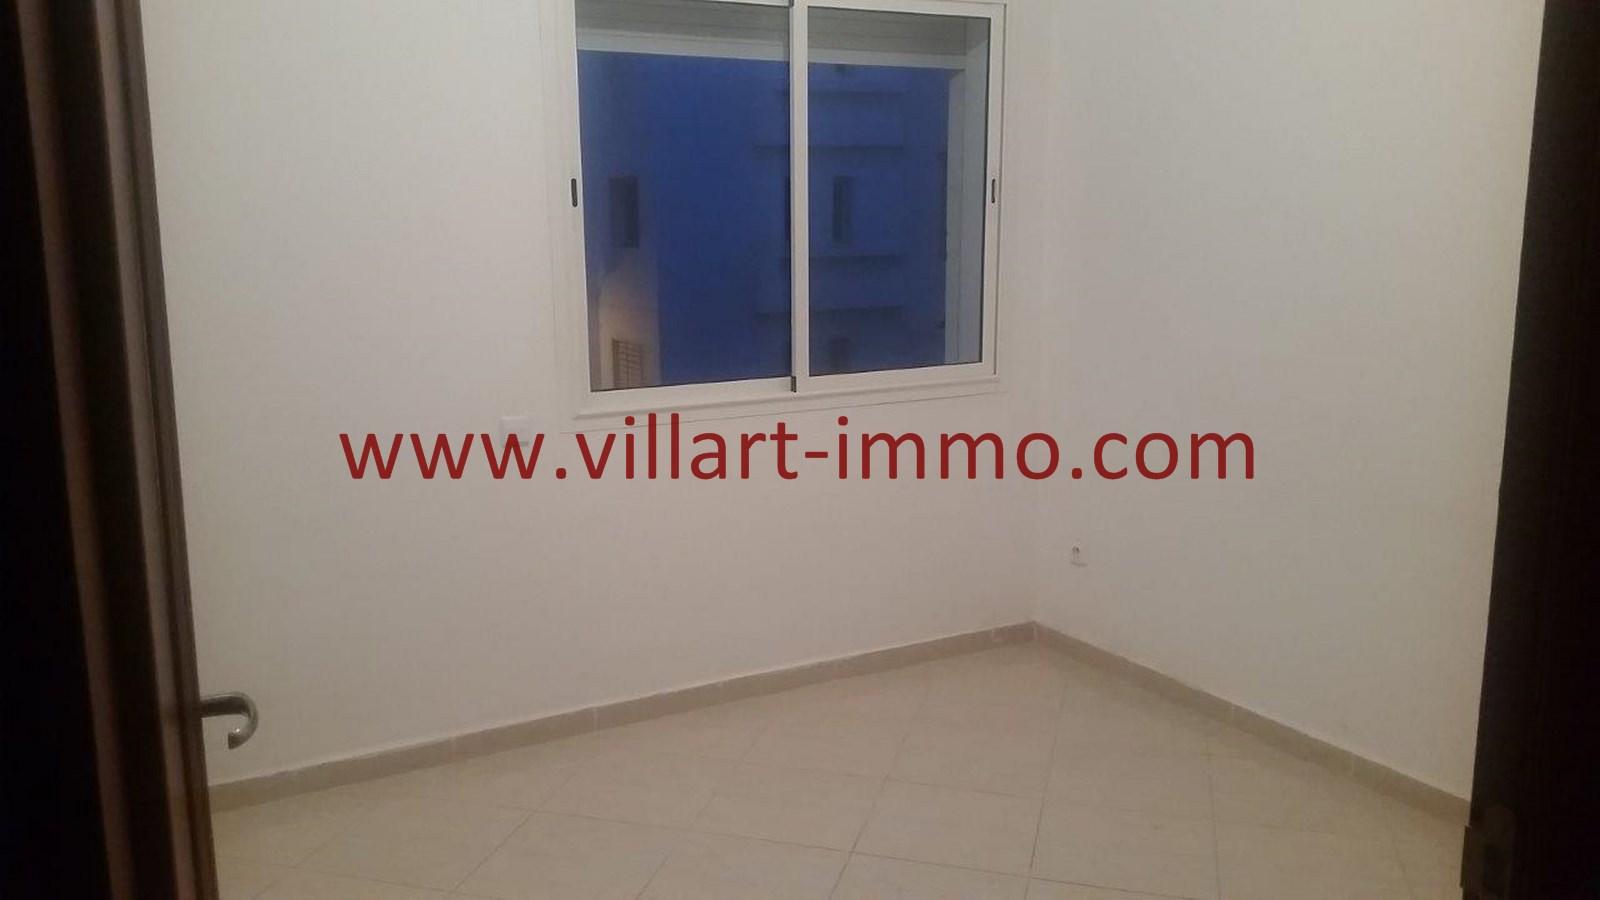 4-Location-Appartement-Non meublé-Tanger-Chambre 1-L913-Villart immo